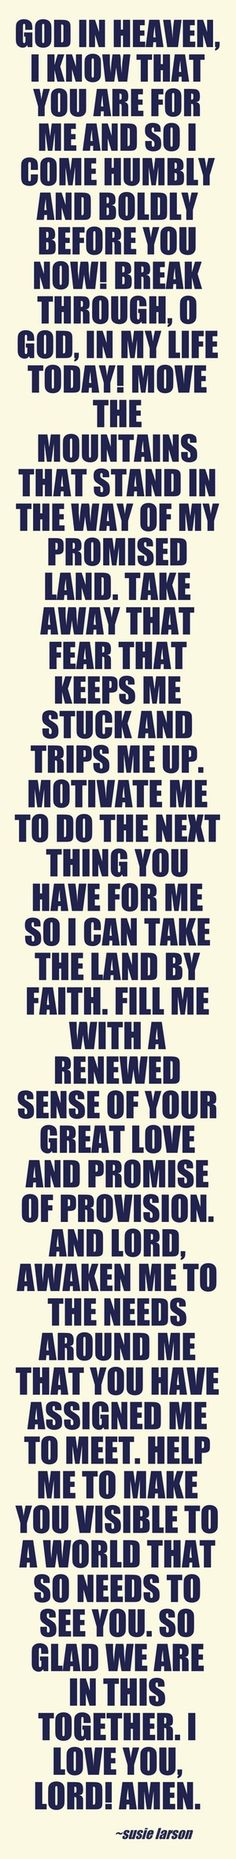 Amen my Lord <3: